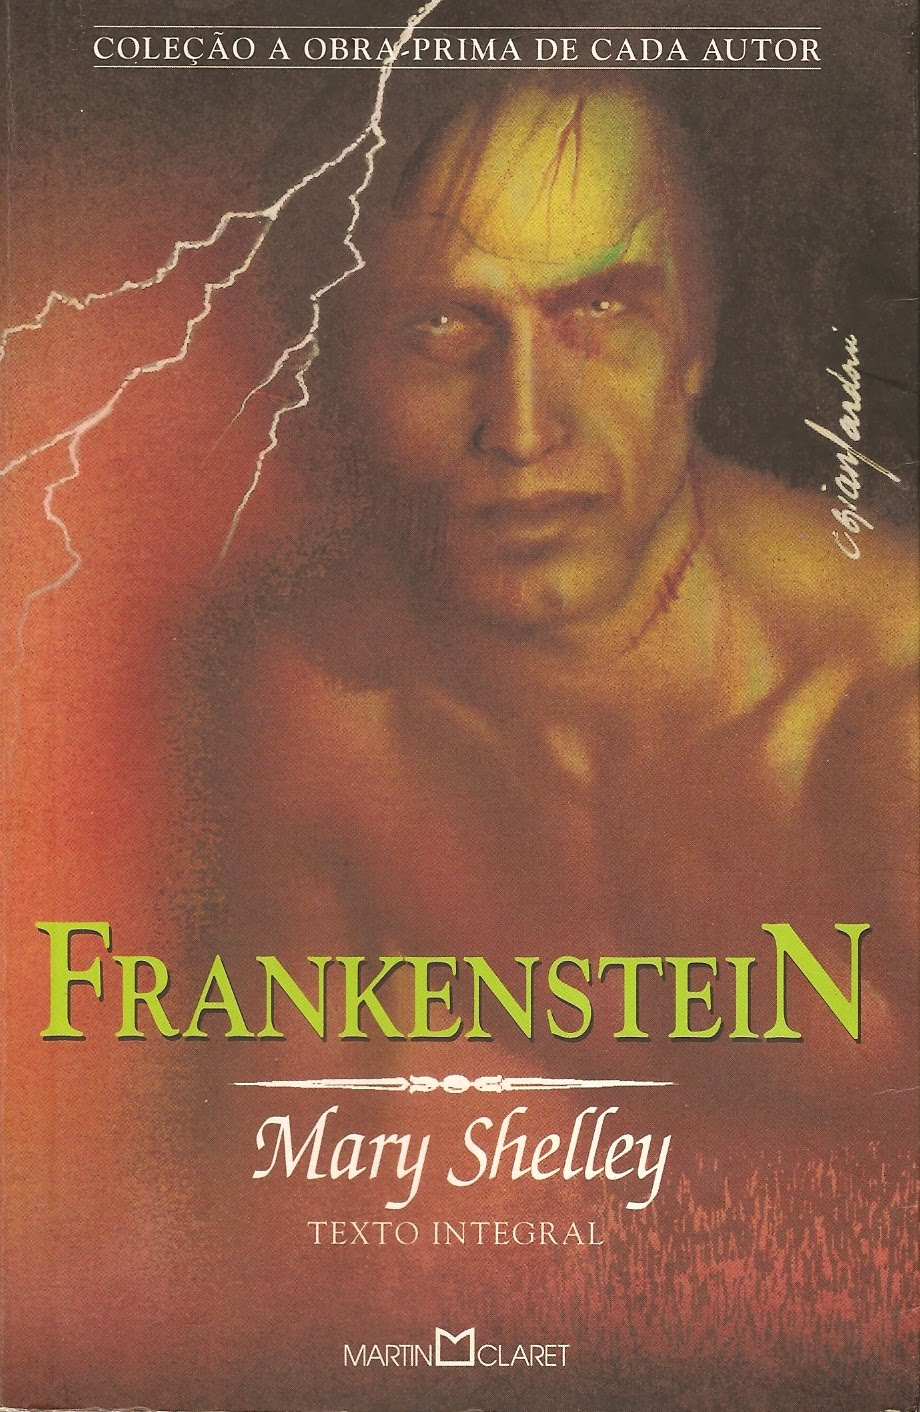 frankenstein and the epistolary novel form essay